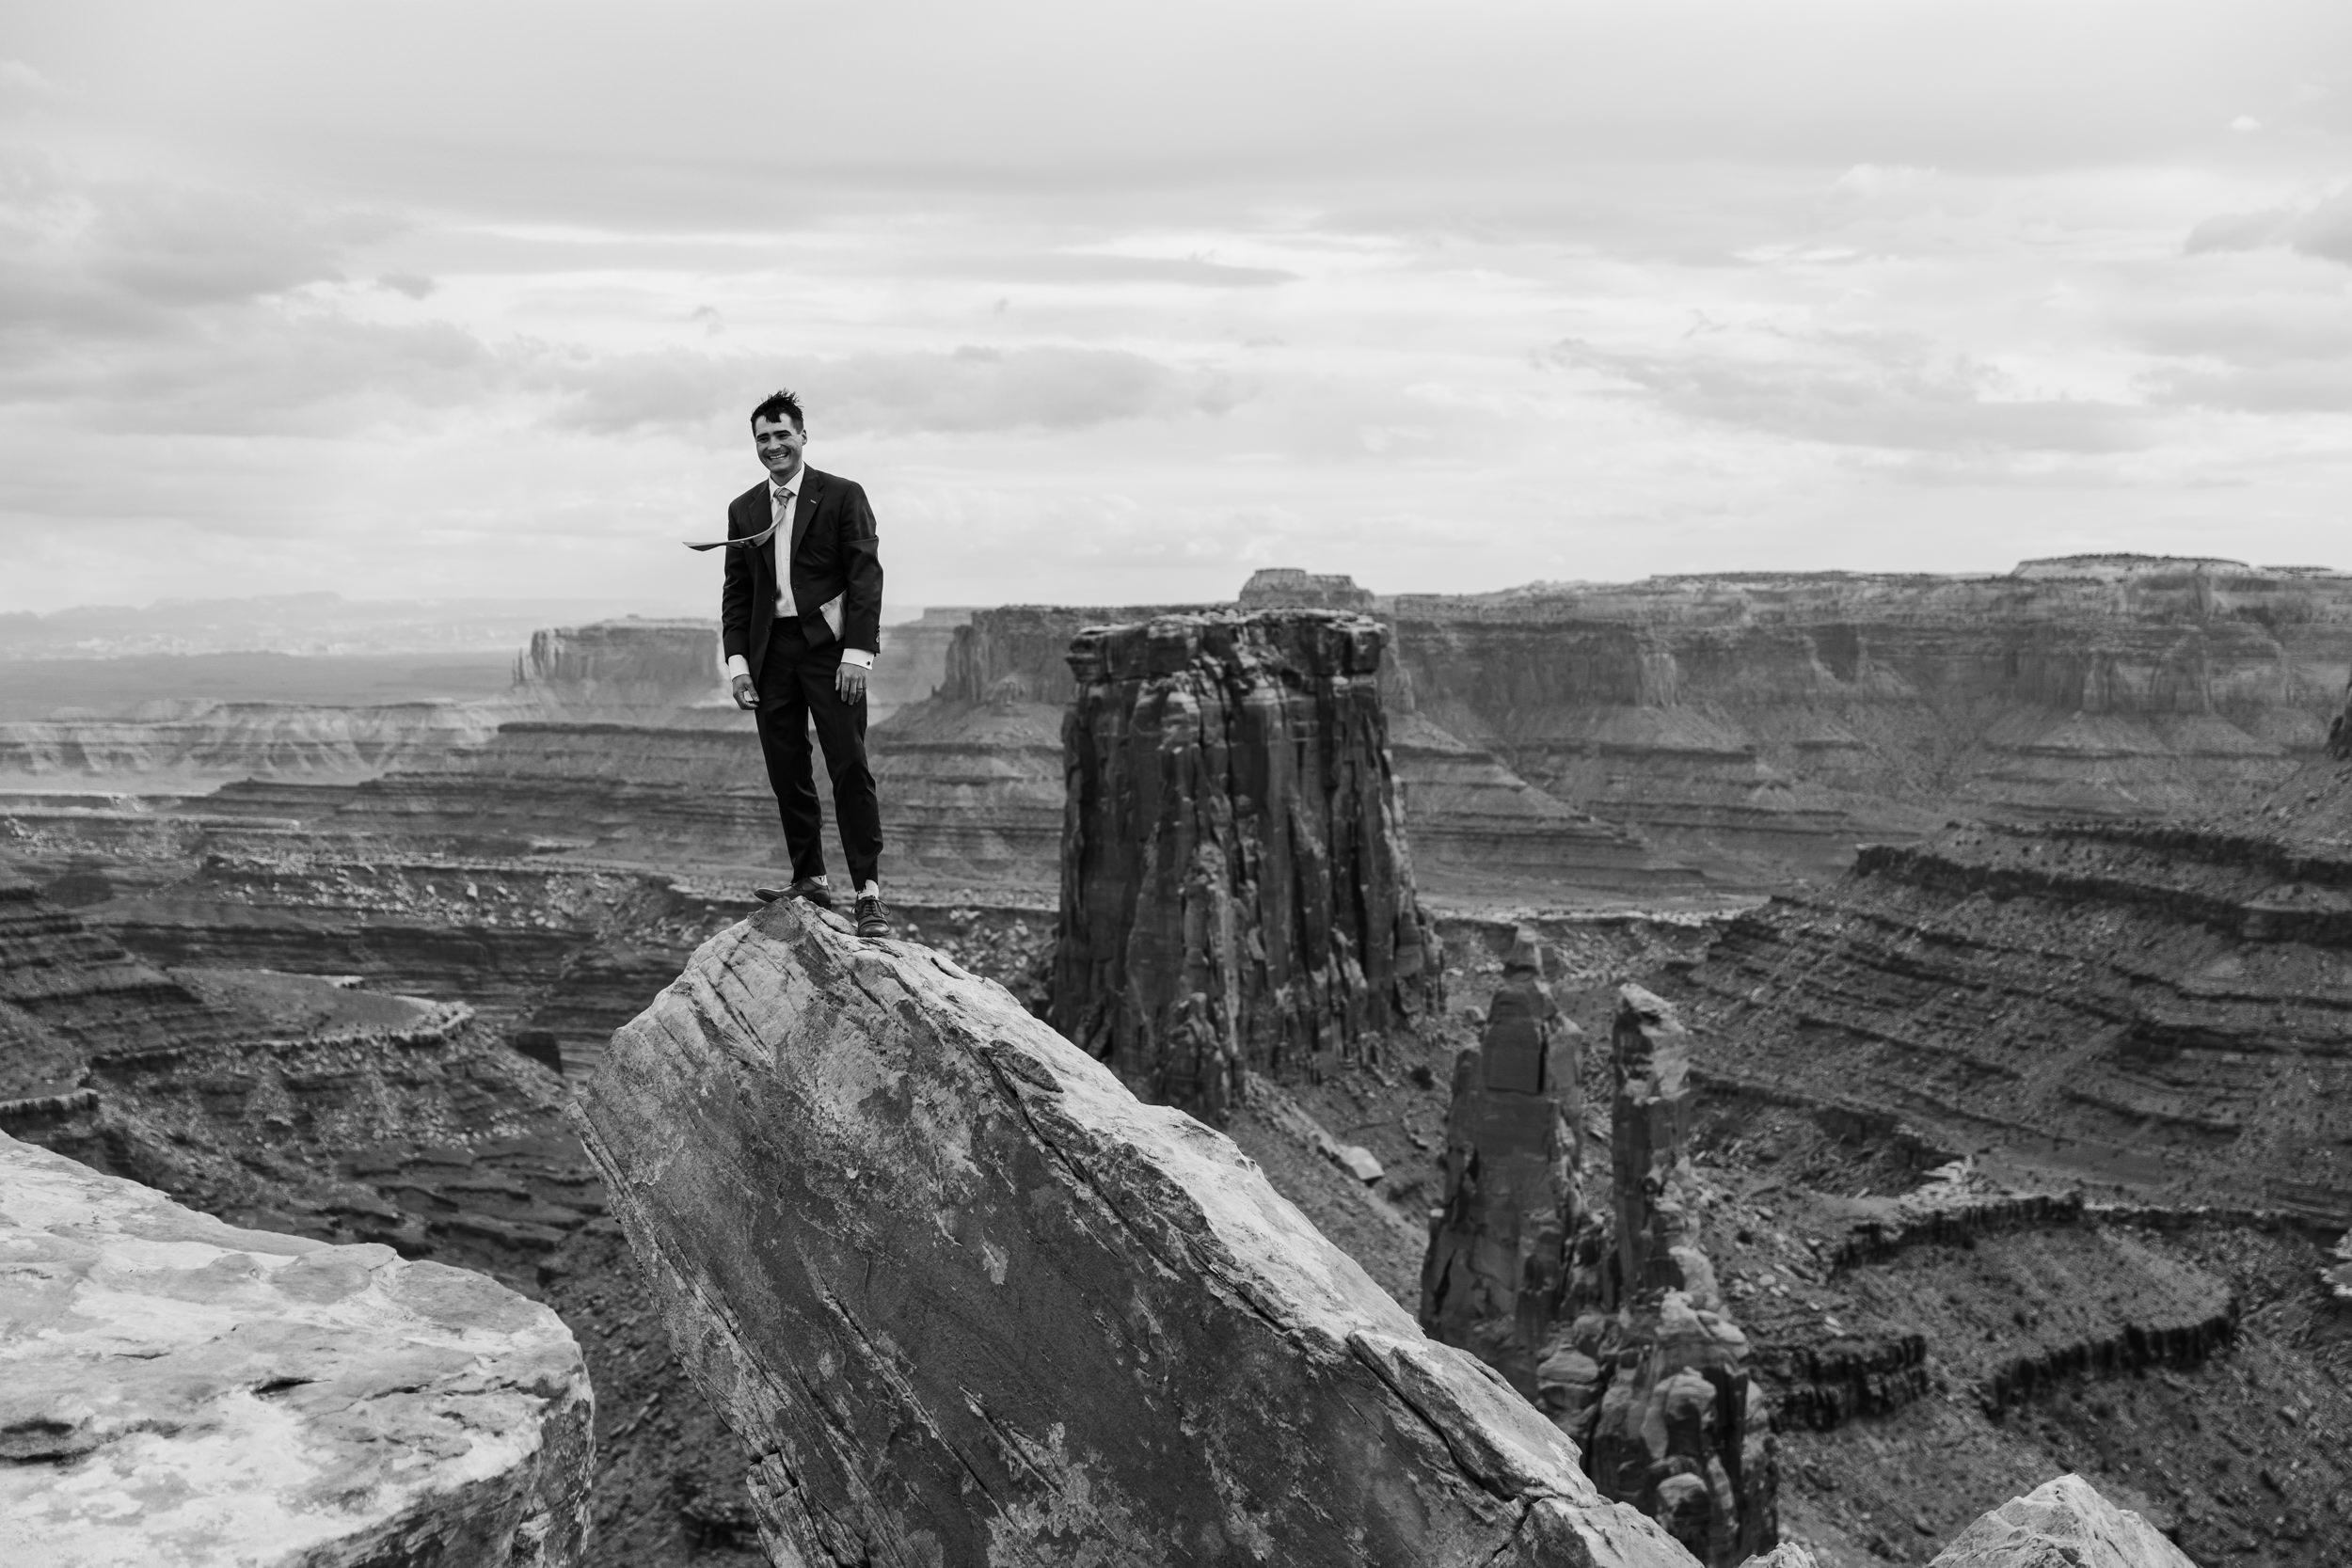 Jeep-Wedding-Moab-Utah-Hearnes-Adventure-Elopement-Photography-24.jpg